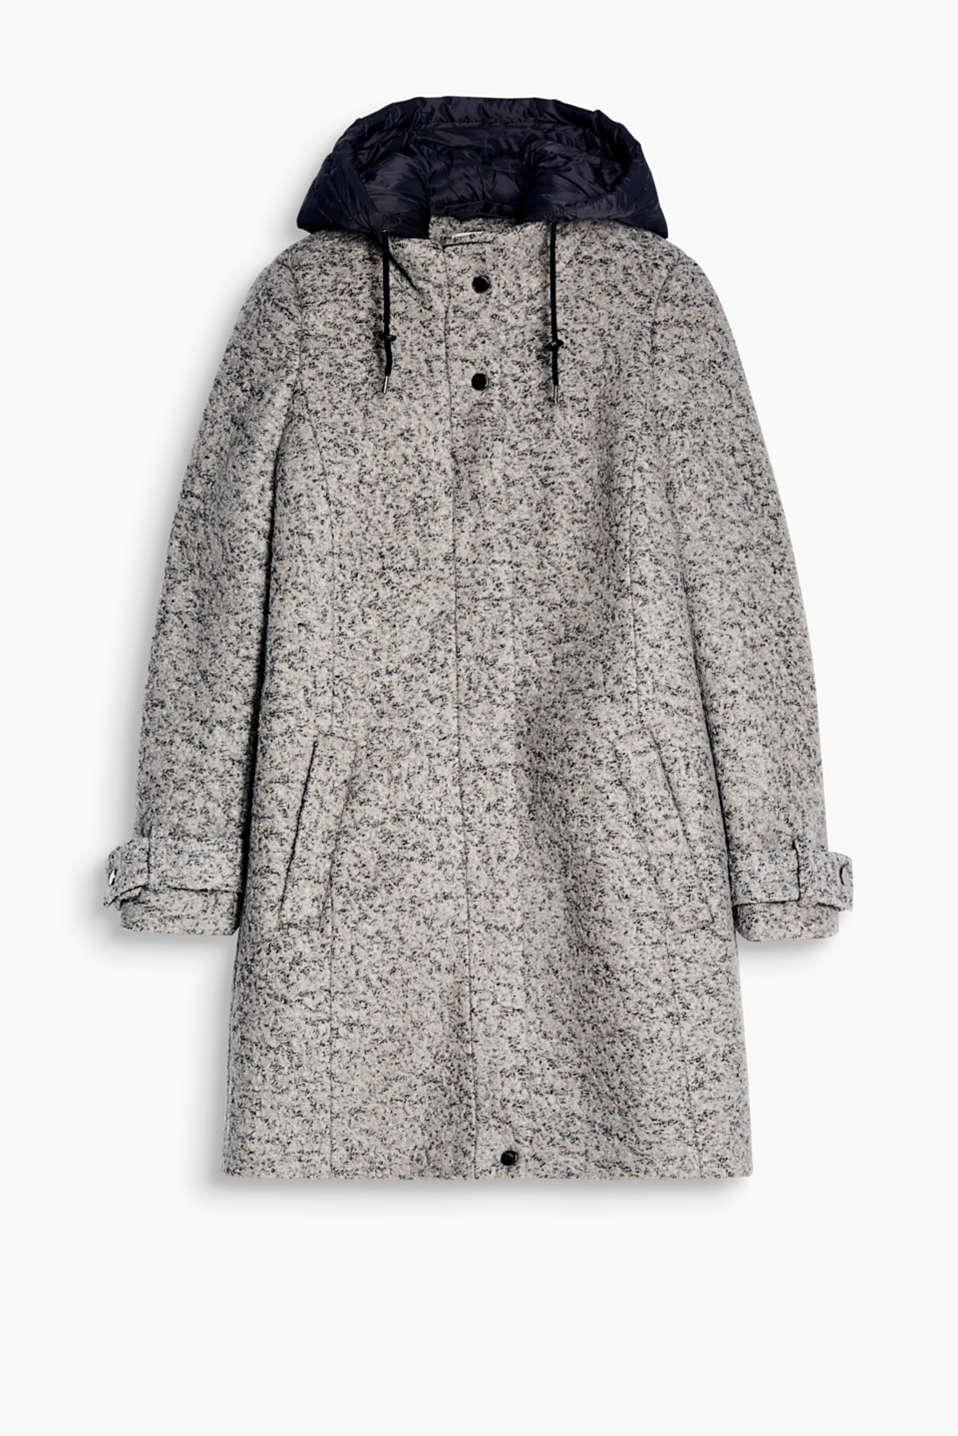 Black boucle coat next